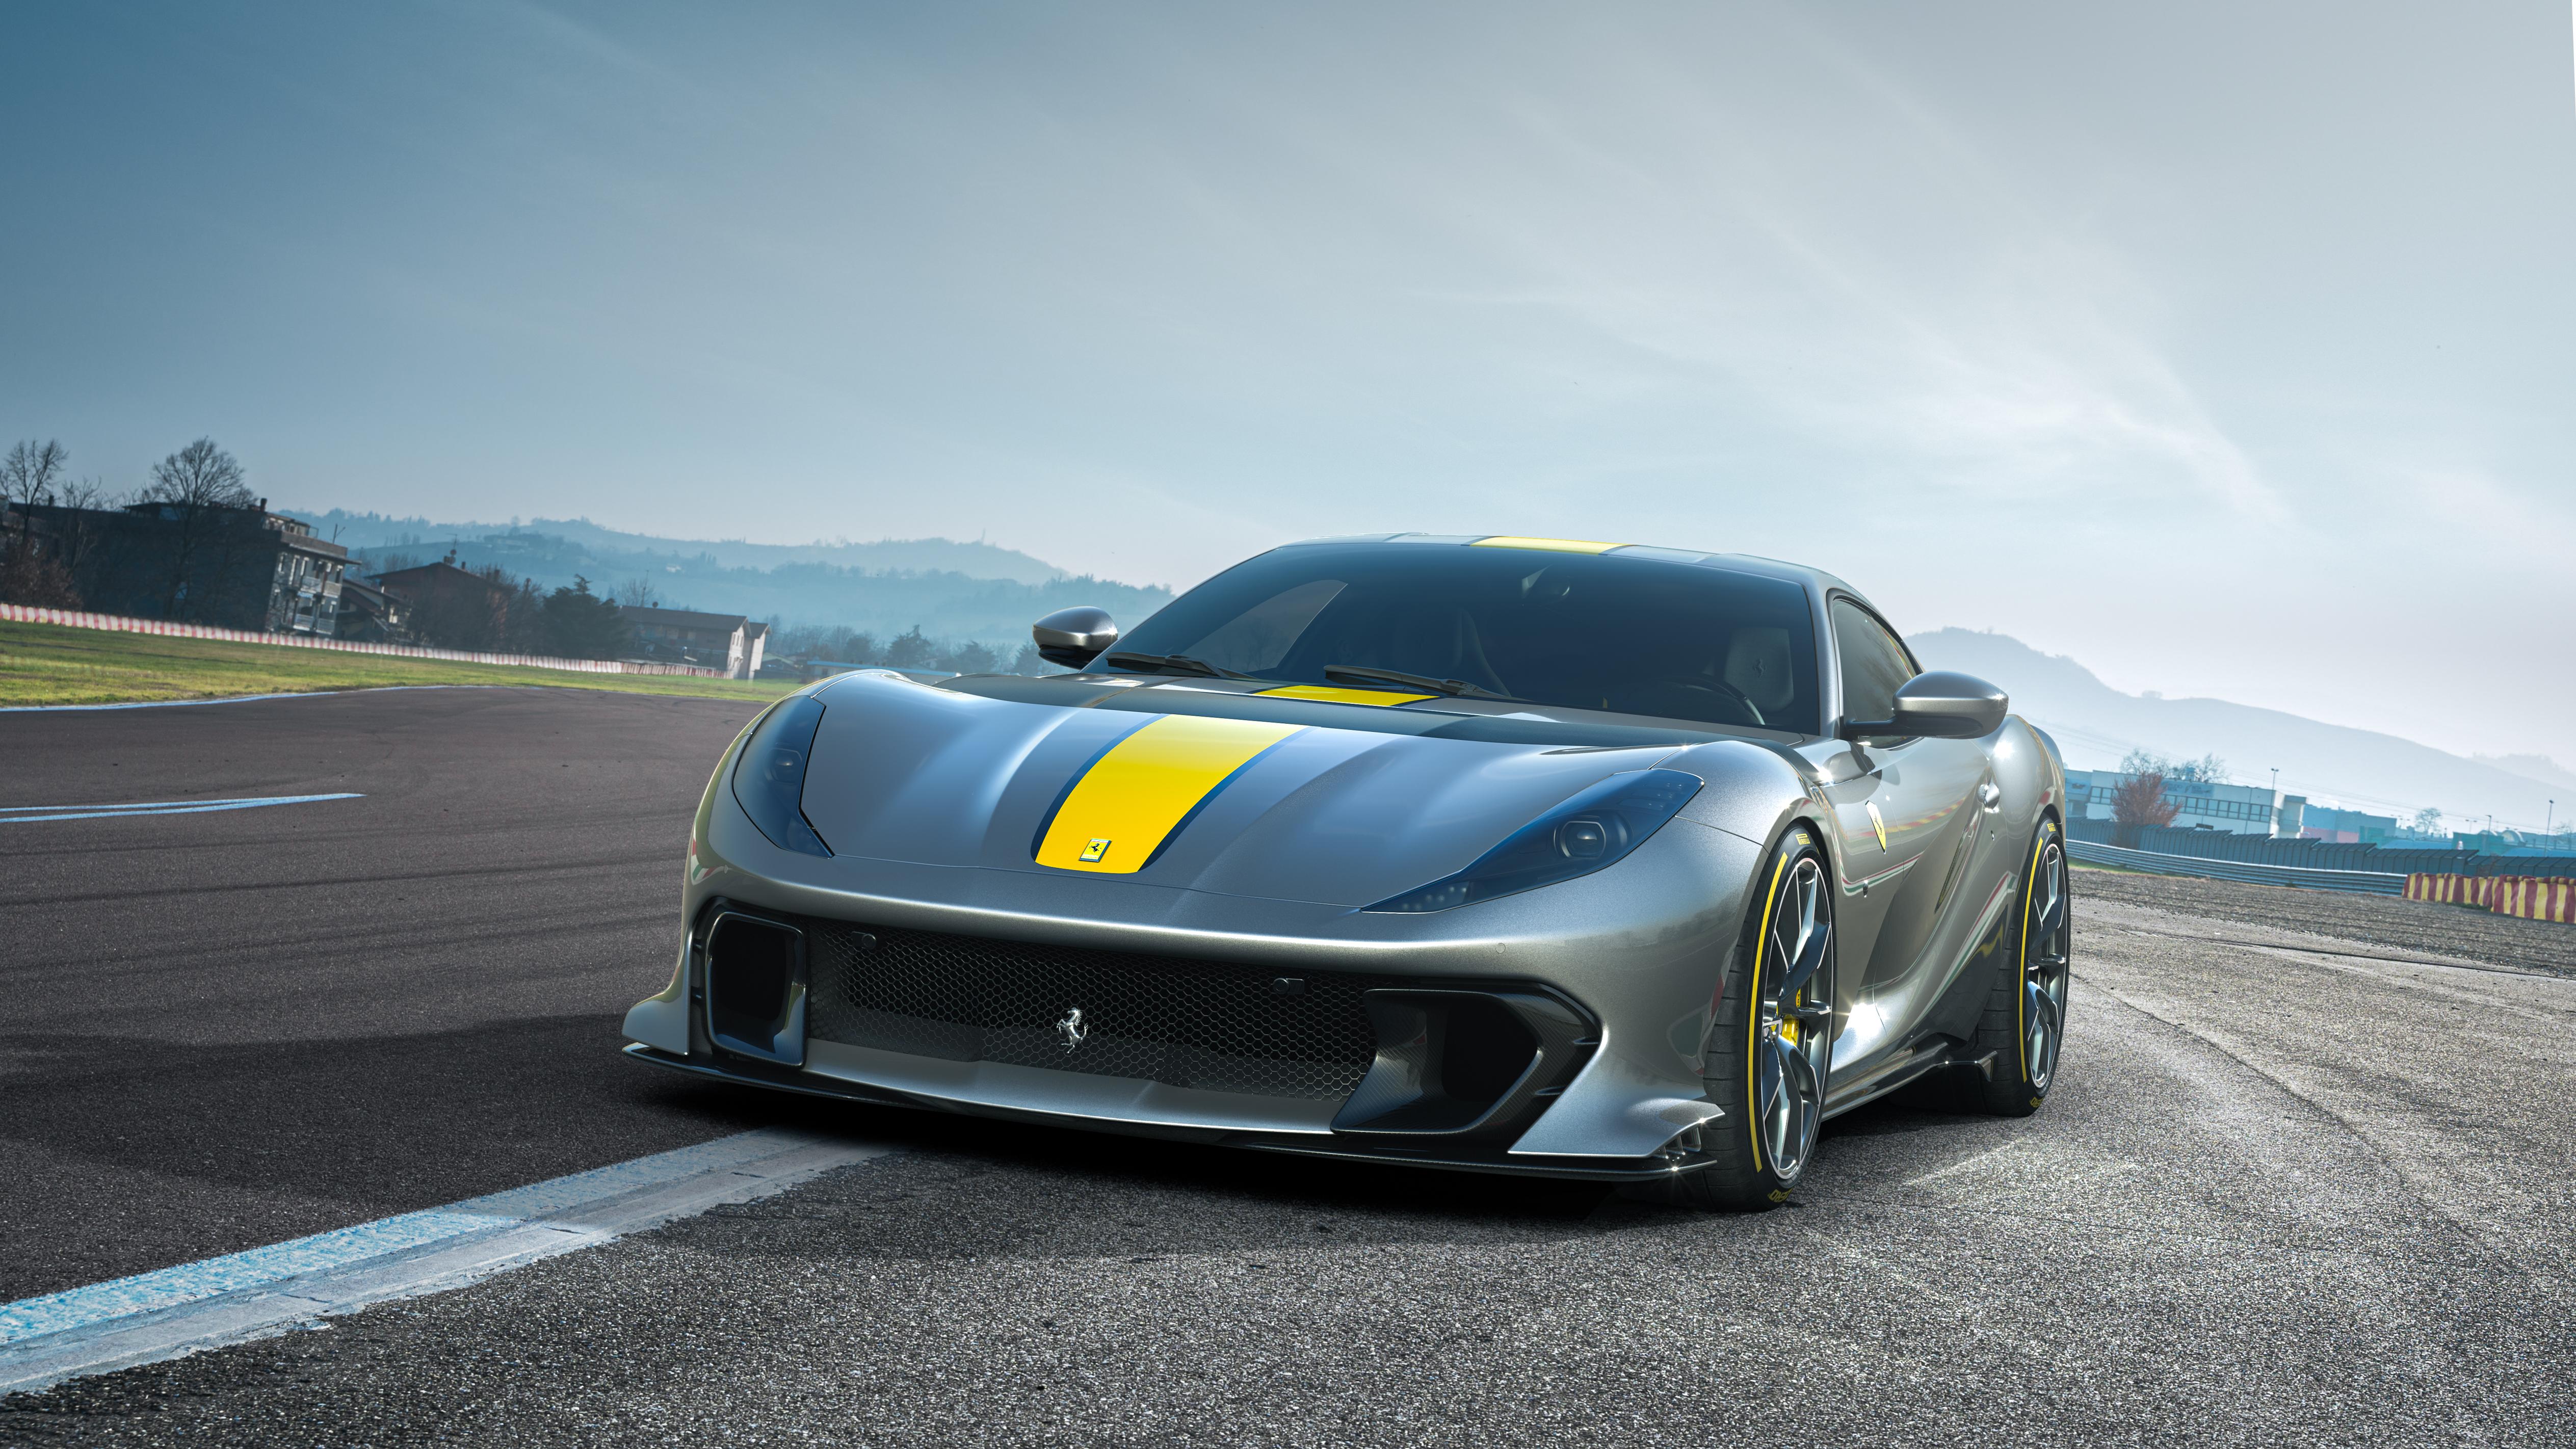 Ferrari's 812 Competizione is powered by a 6.5-liter V12